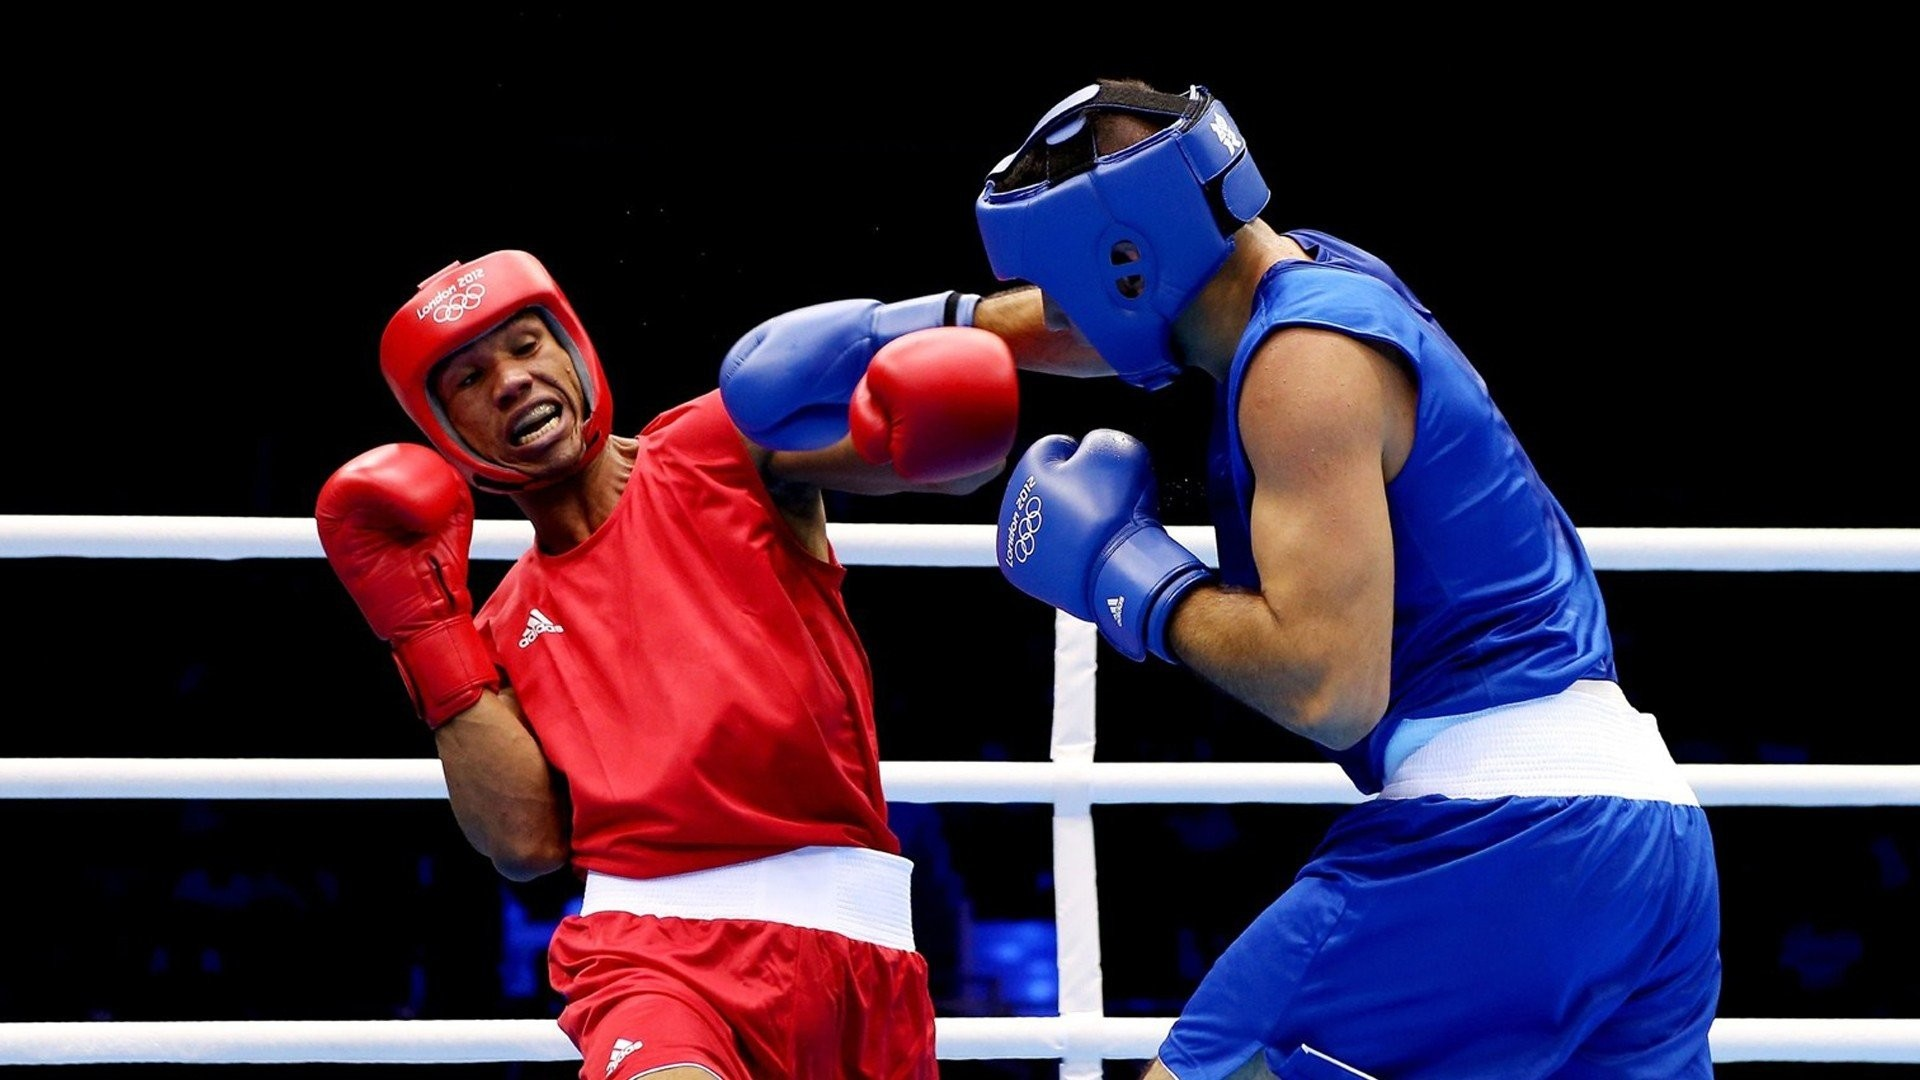 Sport Wallpaper Boxing: Boxing Ring Wallpaper (64+ Images